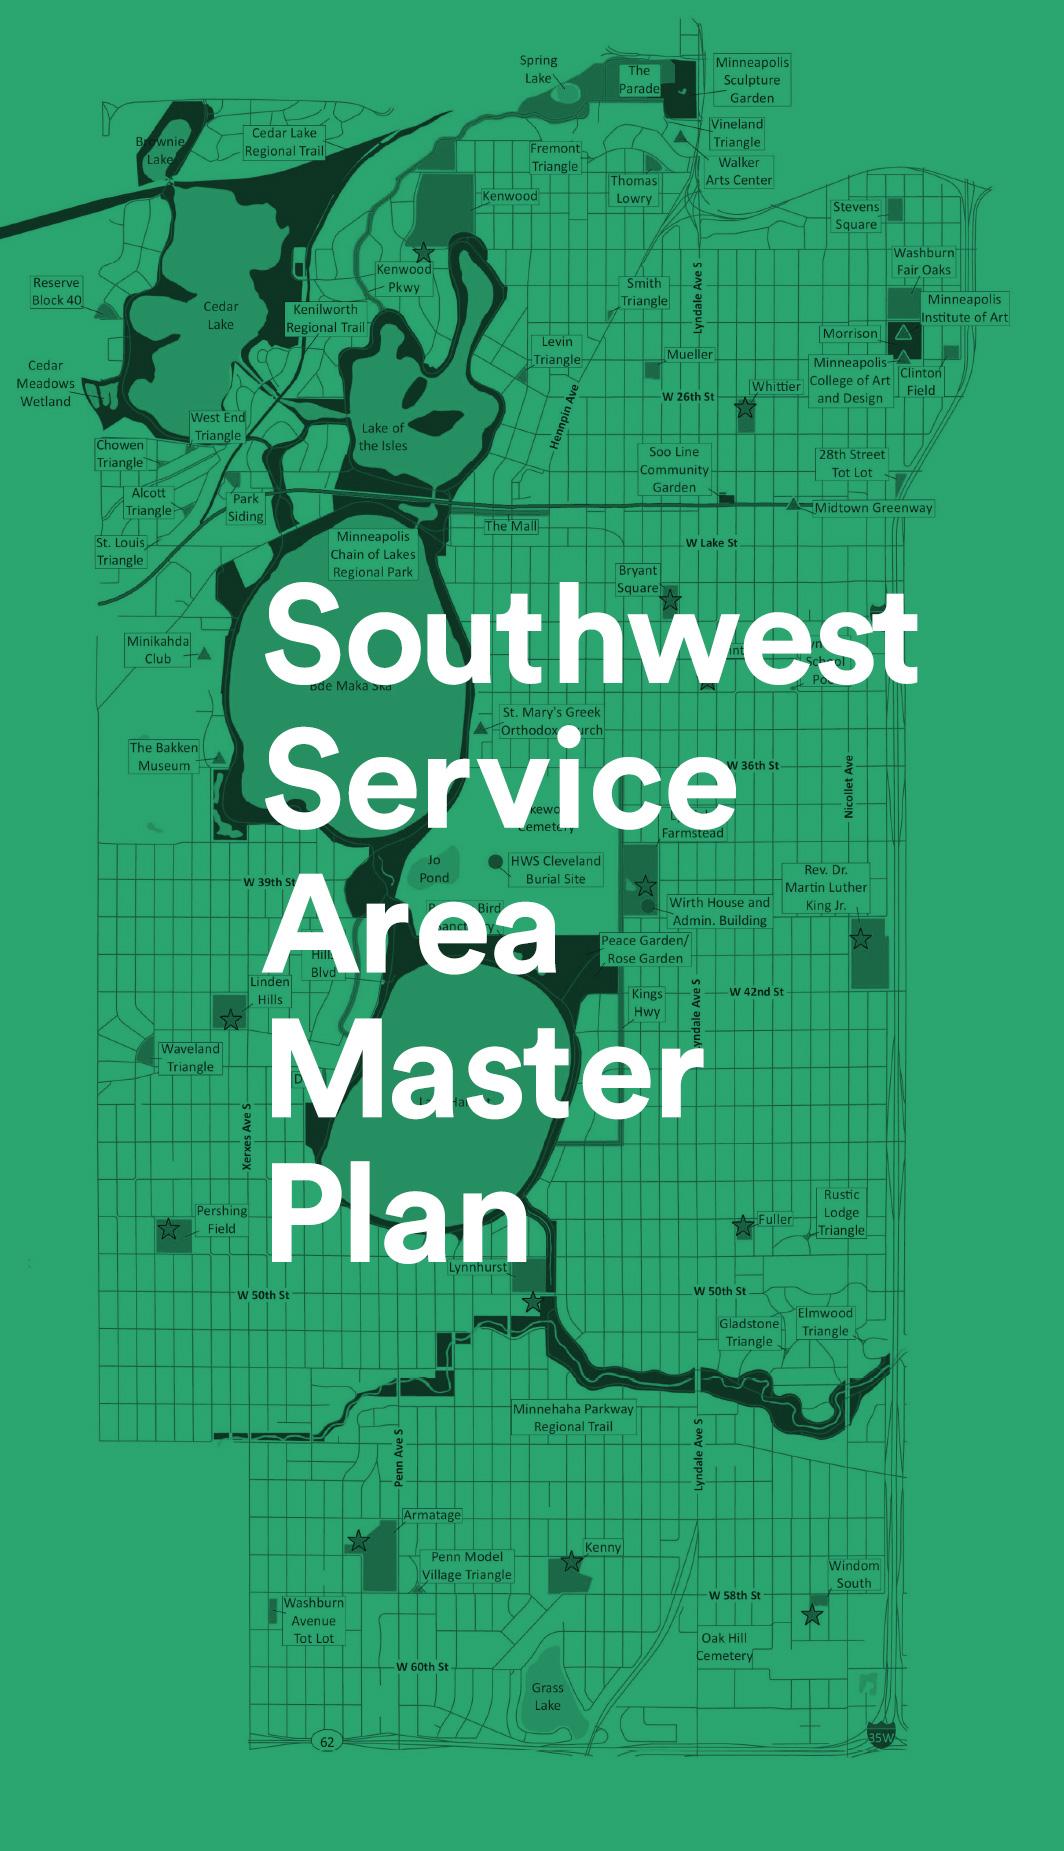 Southwest-Service-Area-Project-Map.jpg